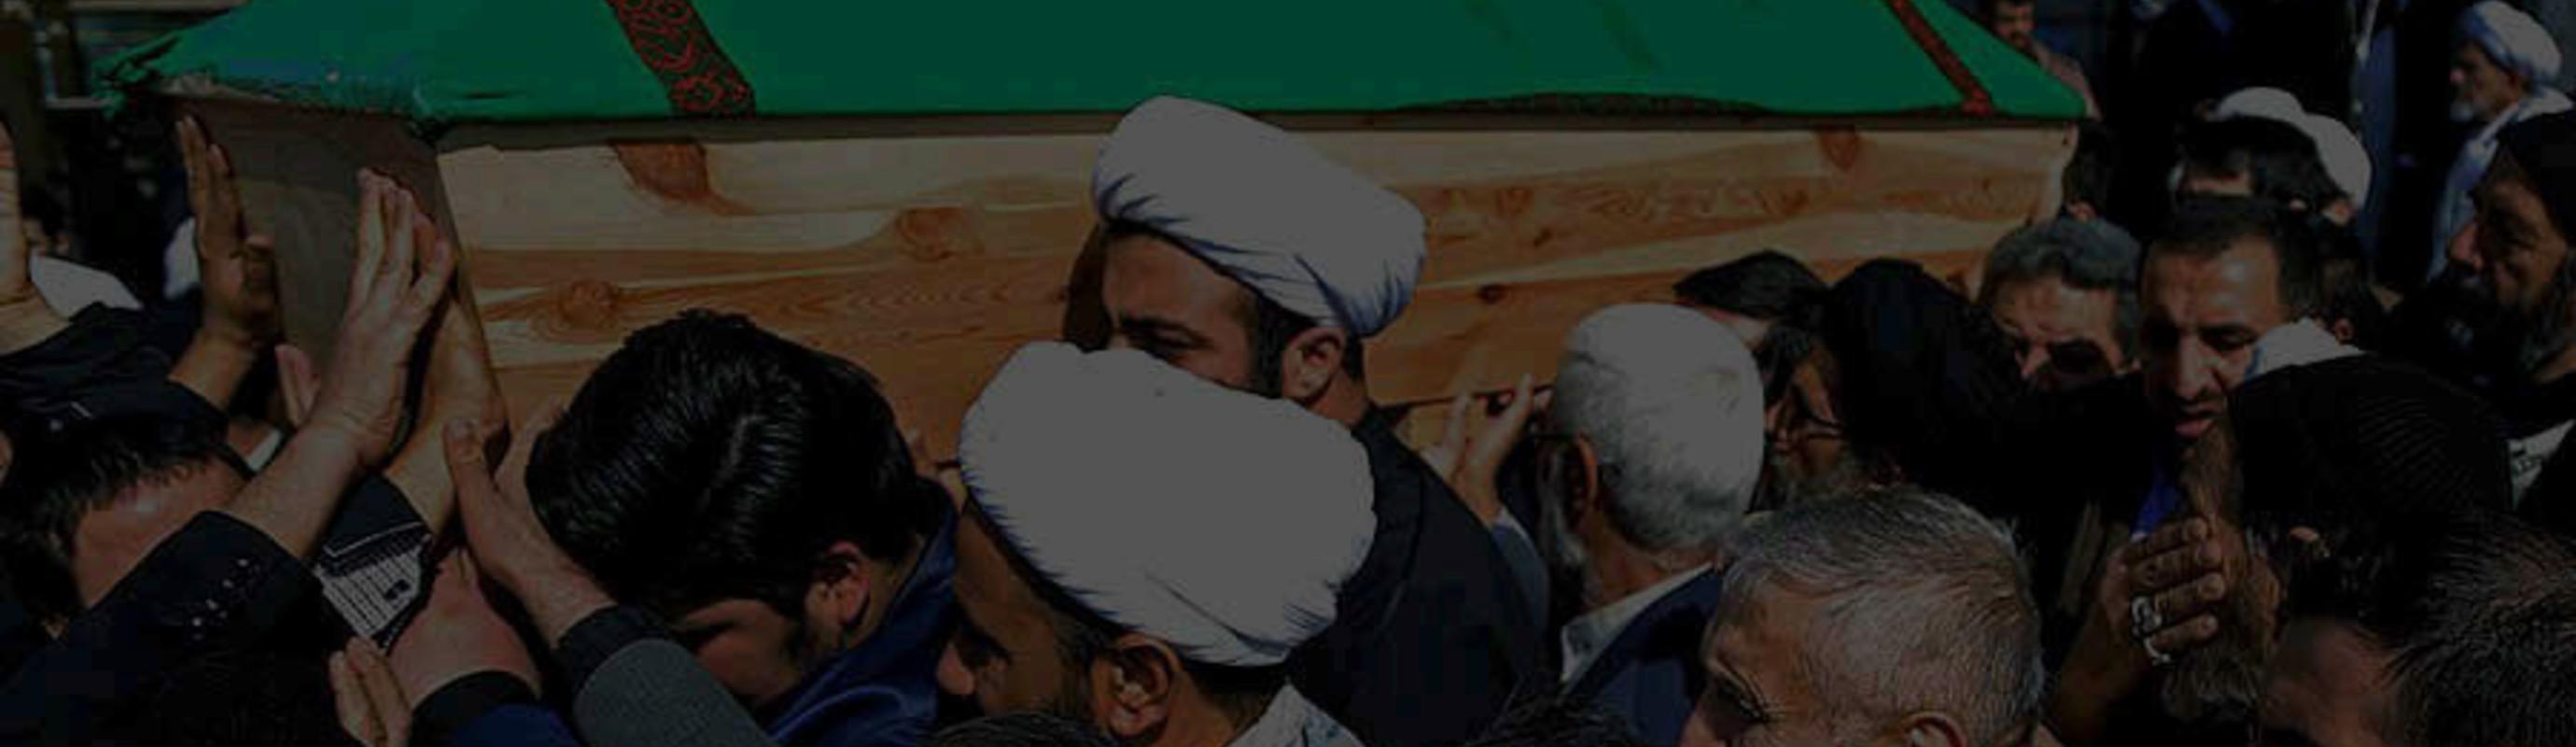 """..the passing of Seyed Morteza Salehi Khansari.."""